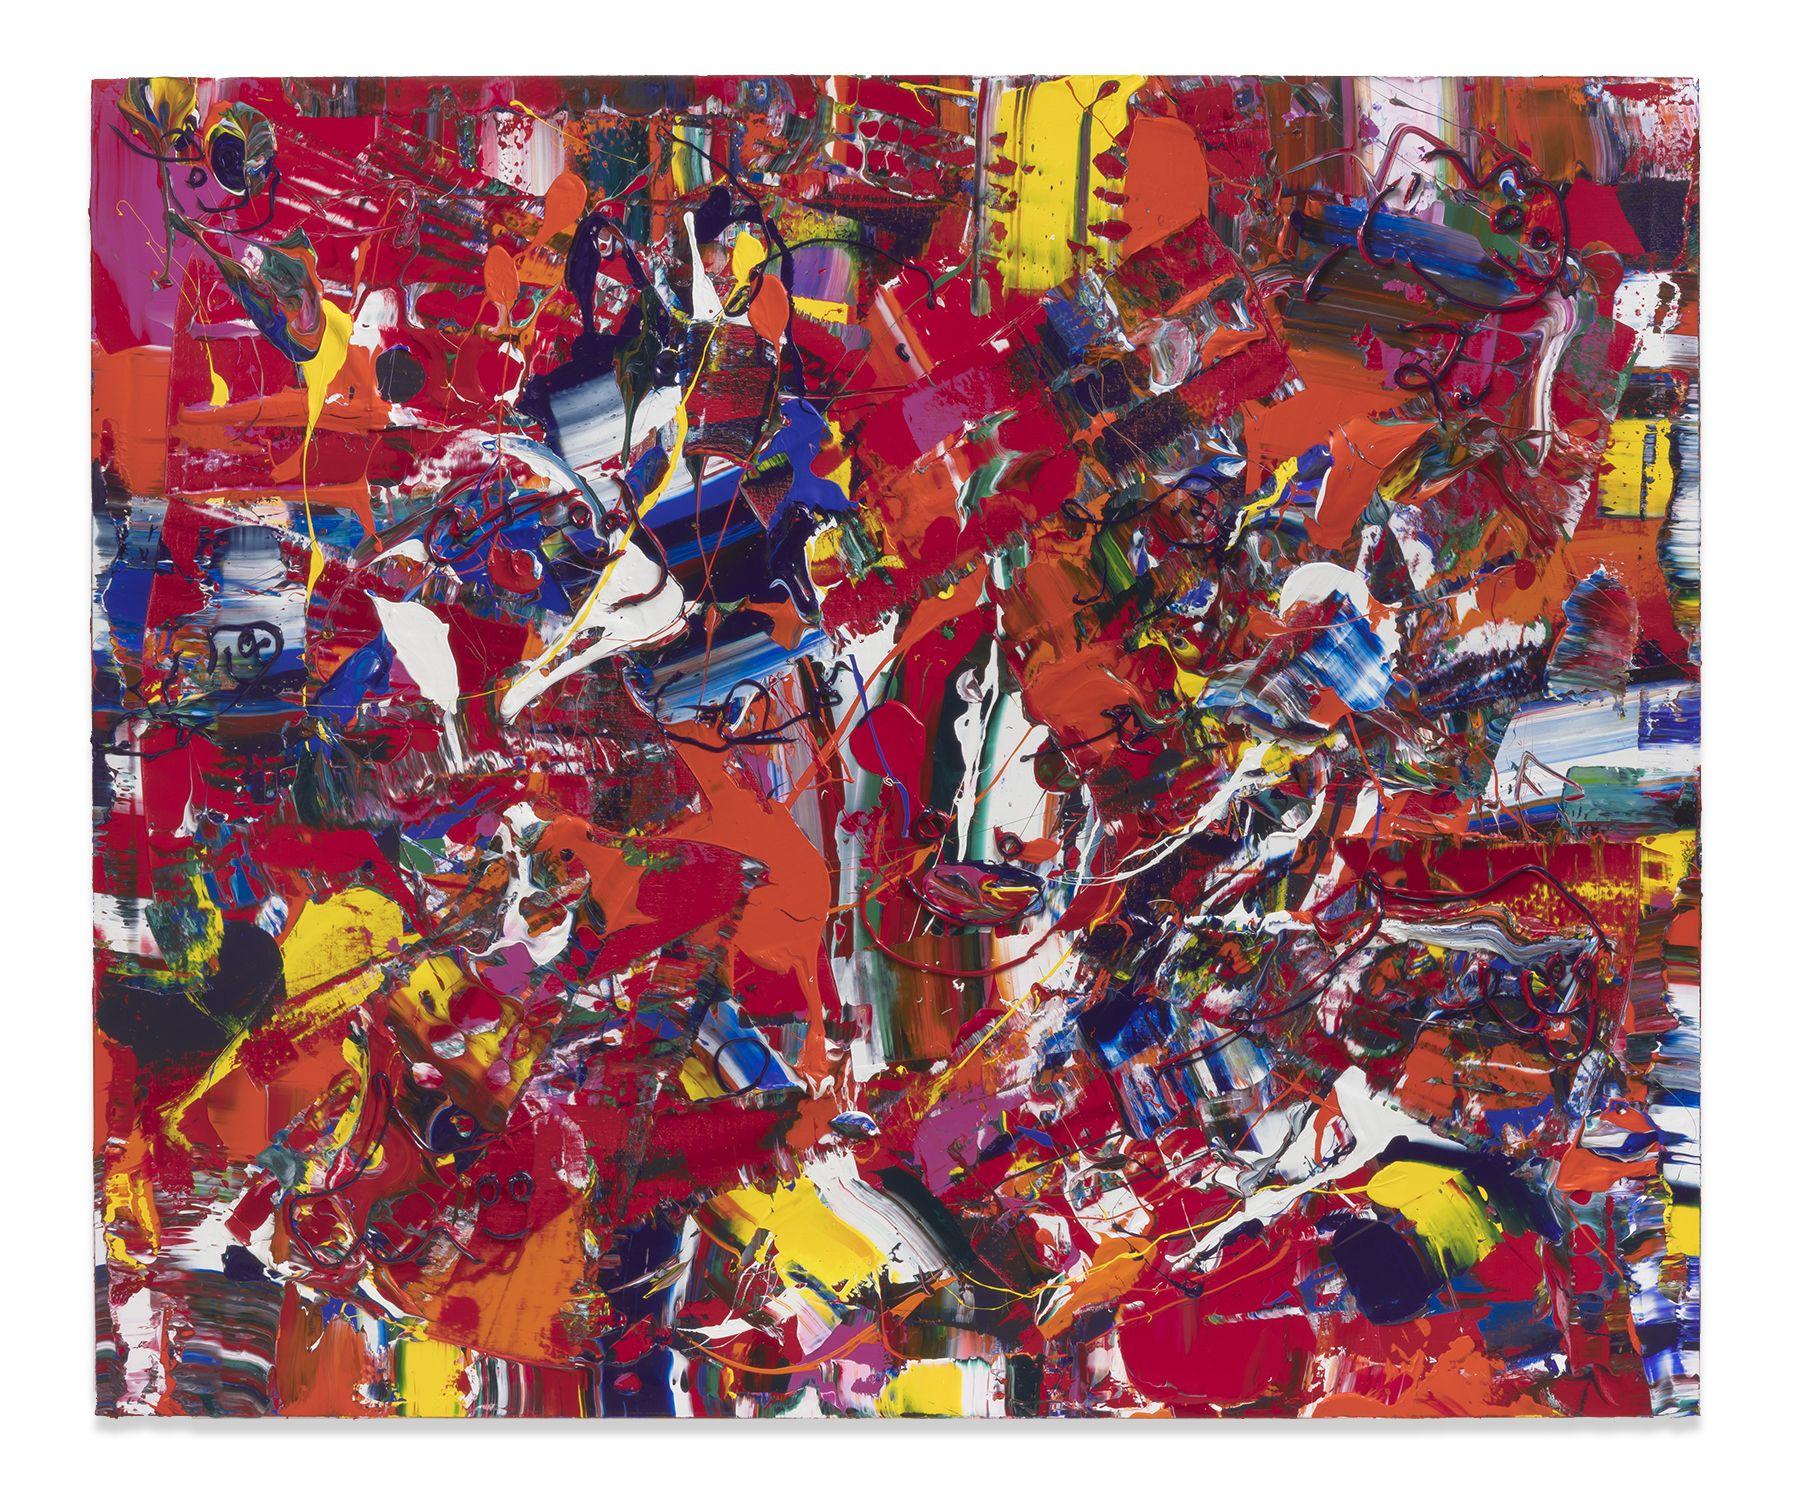 Michael Reafsnyder, Paint Chew, 2019, Acrylic on linen